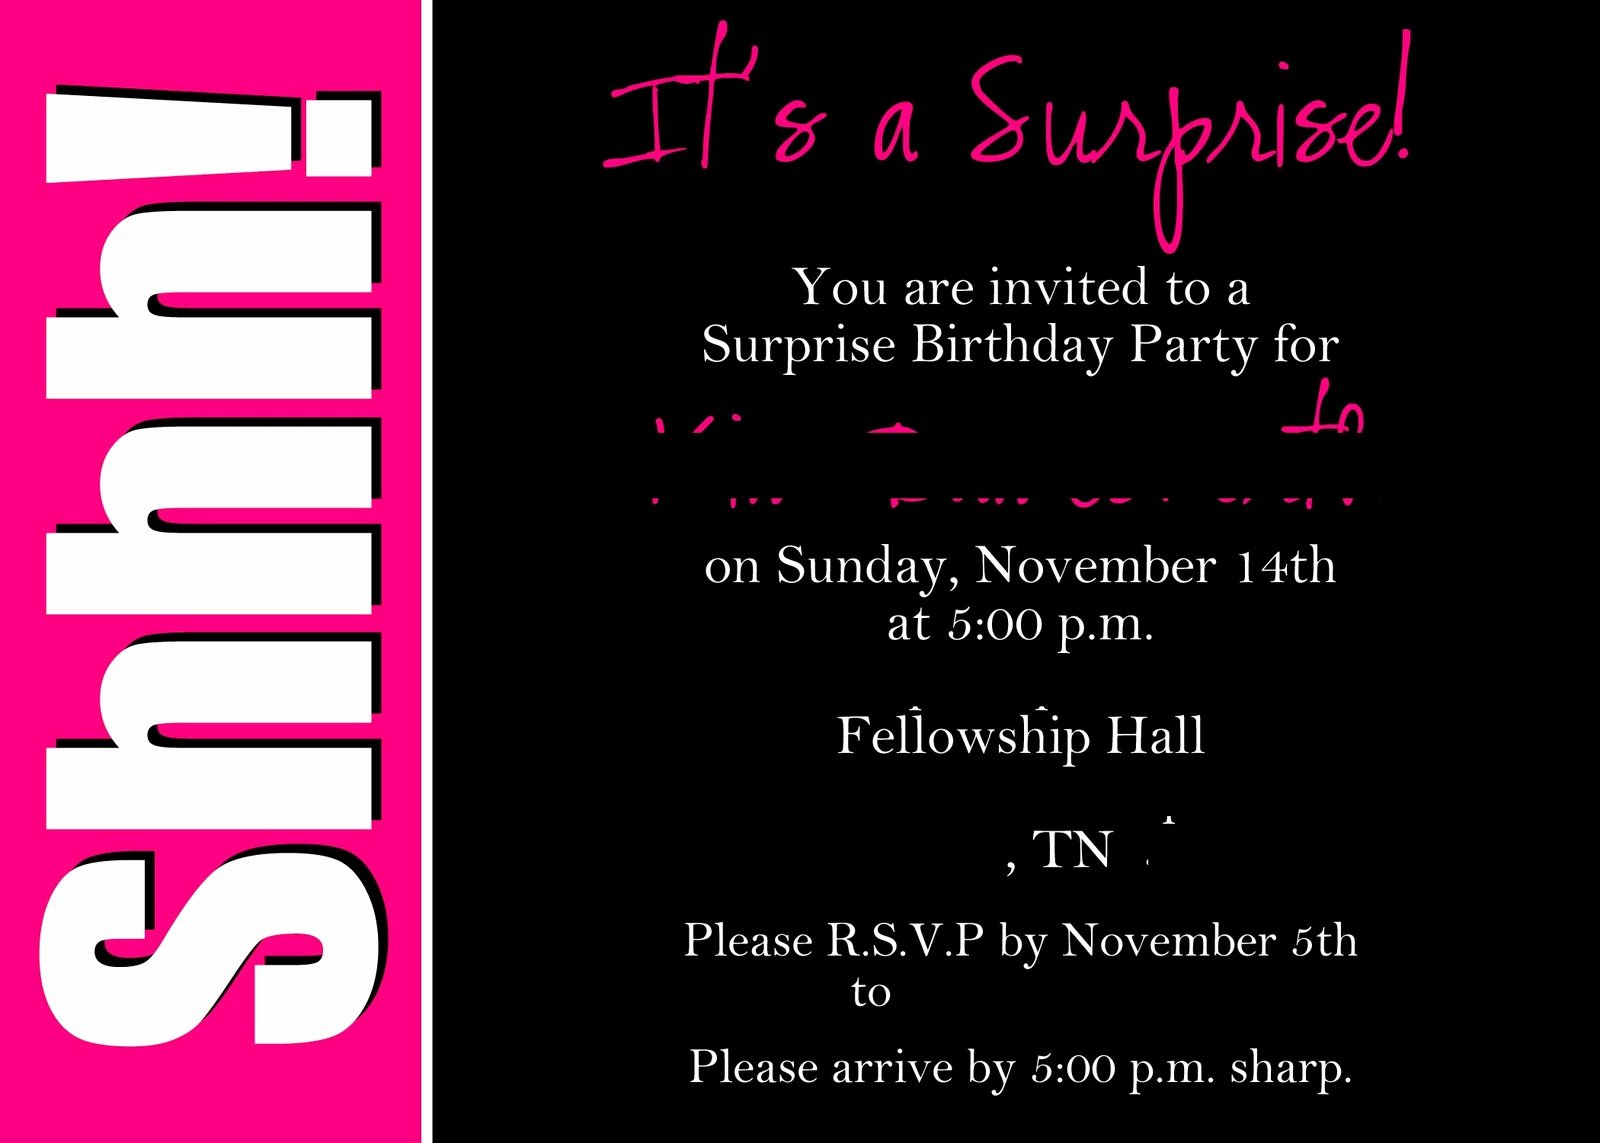 Surprise Party Invitations Templates Free Luxury Alicia S Delightful Designs Shhhh It S A Surprise